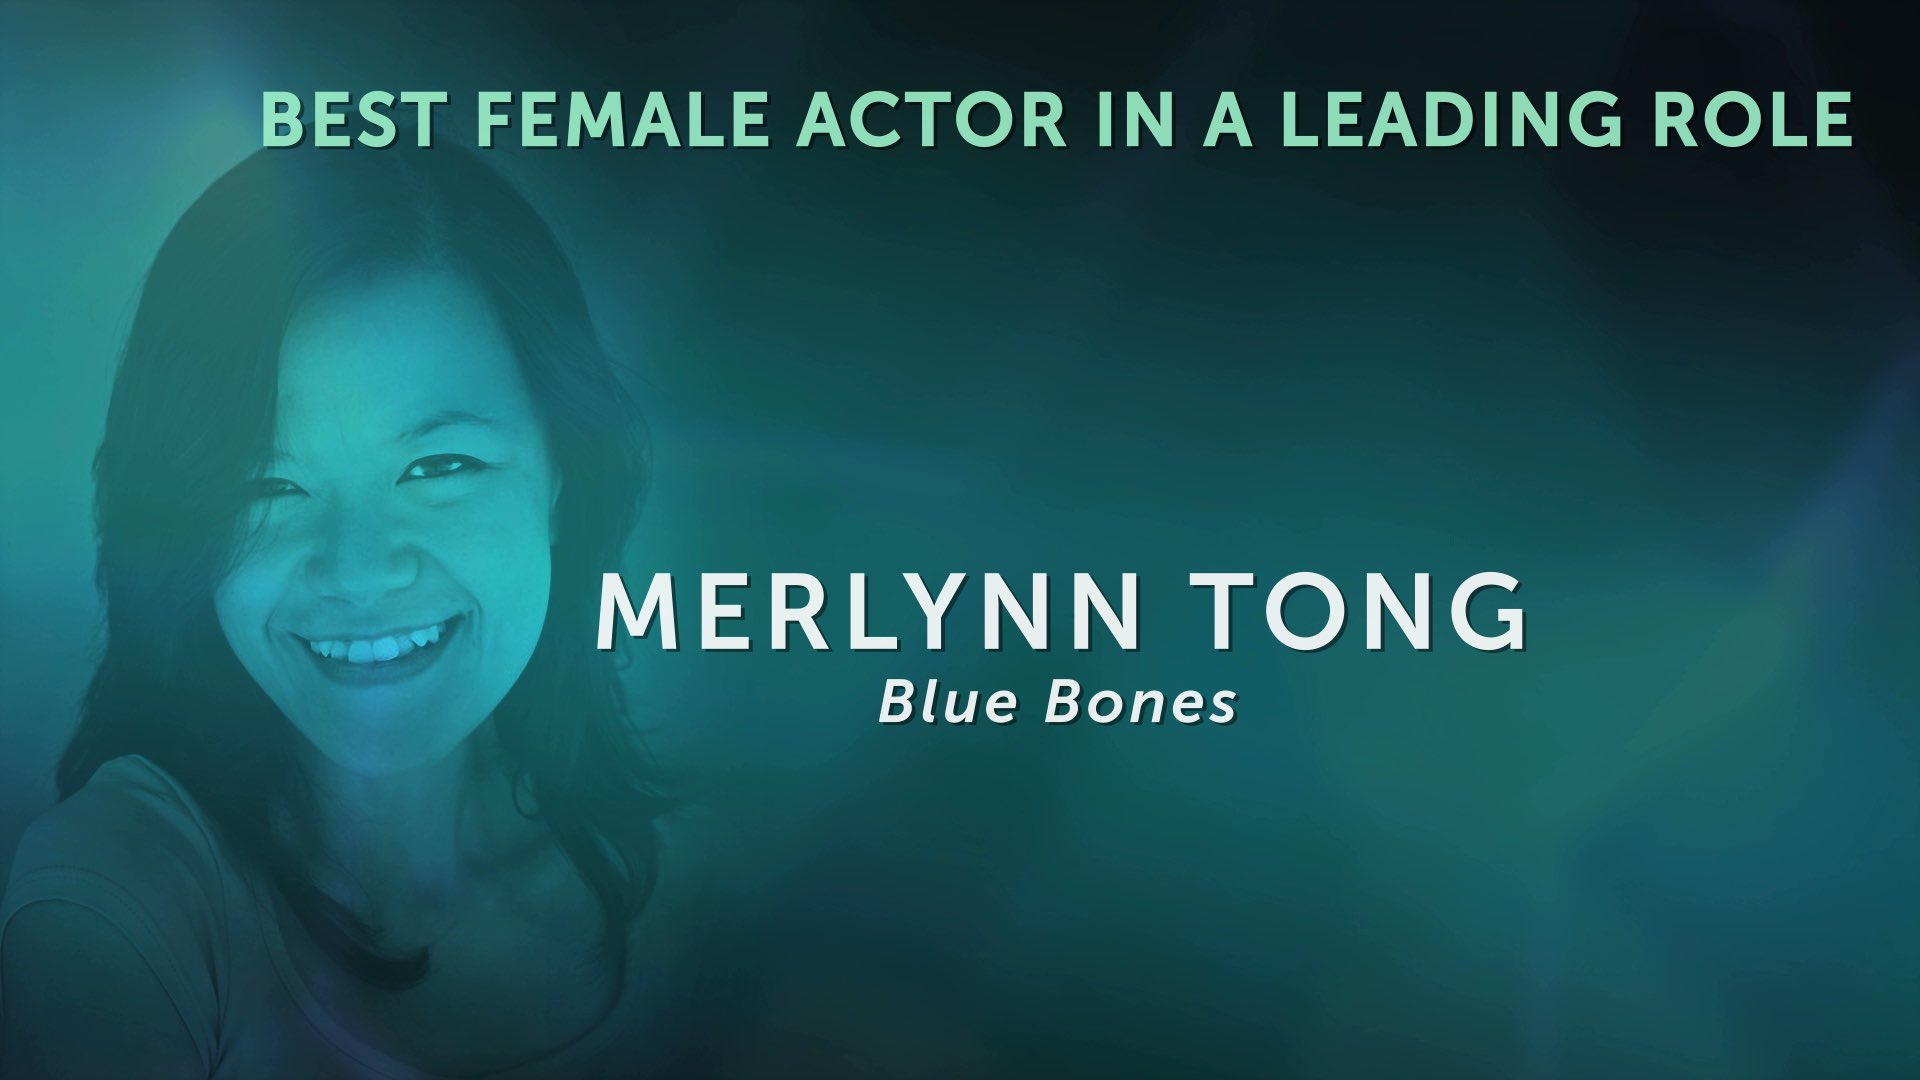 Merlynn Tong